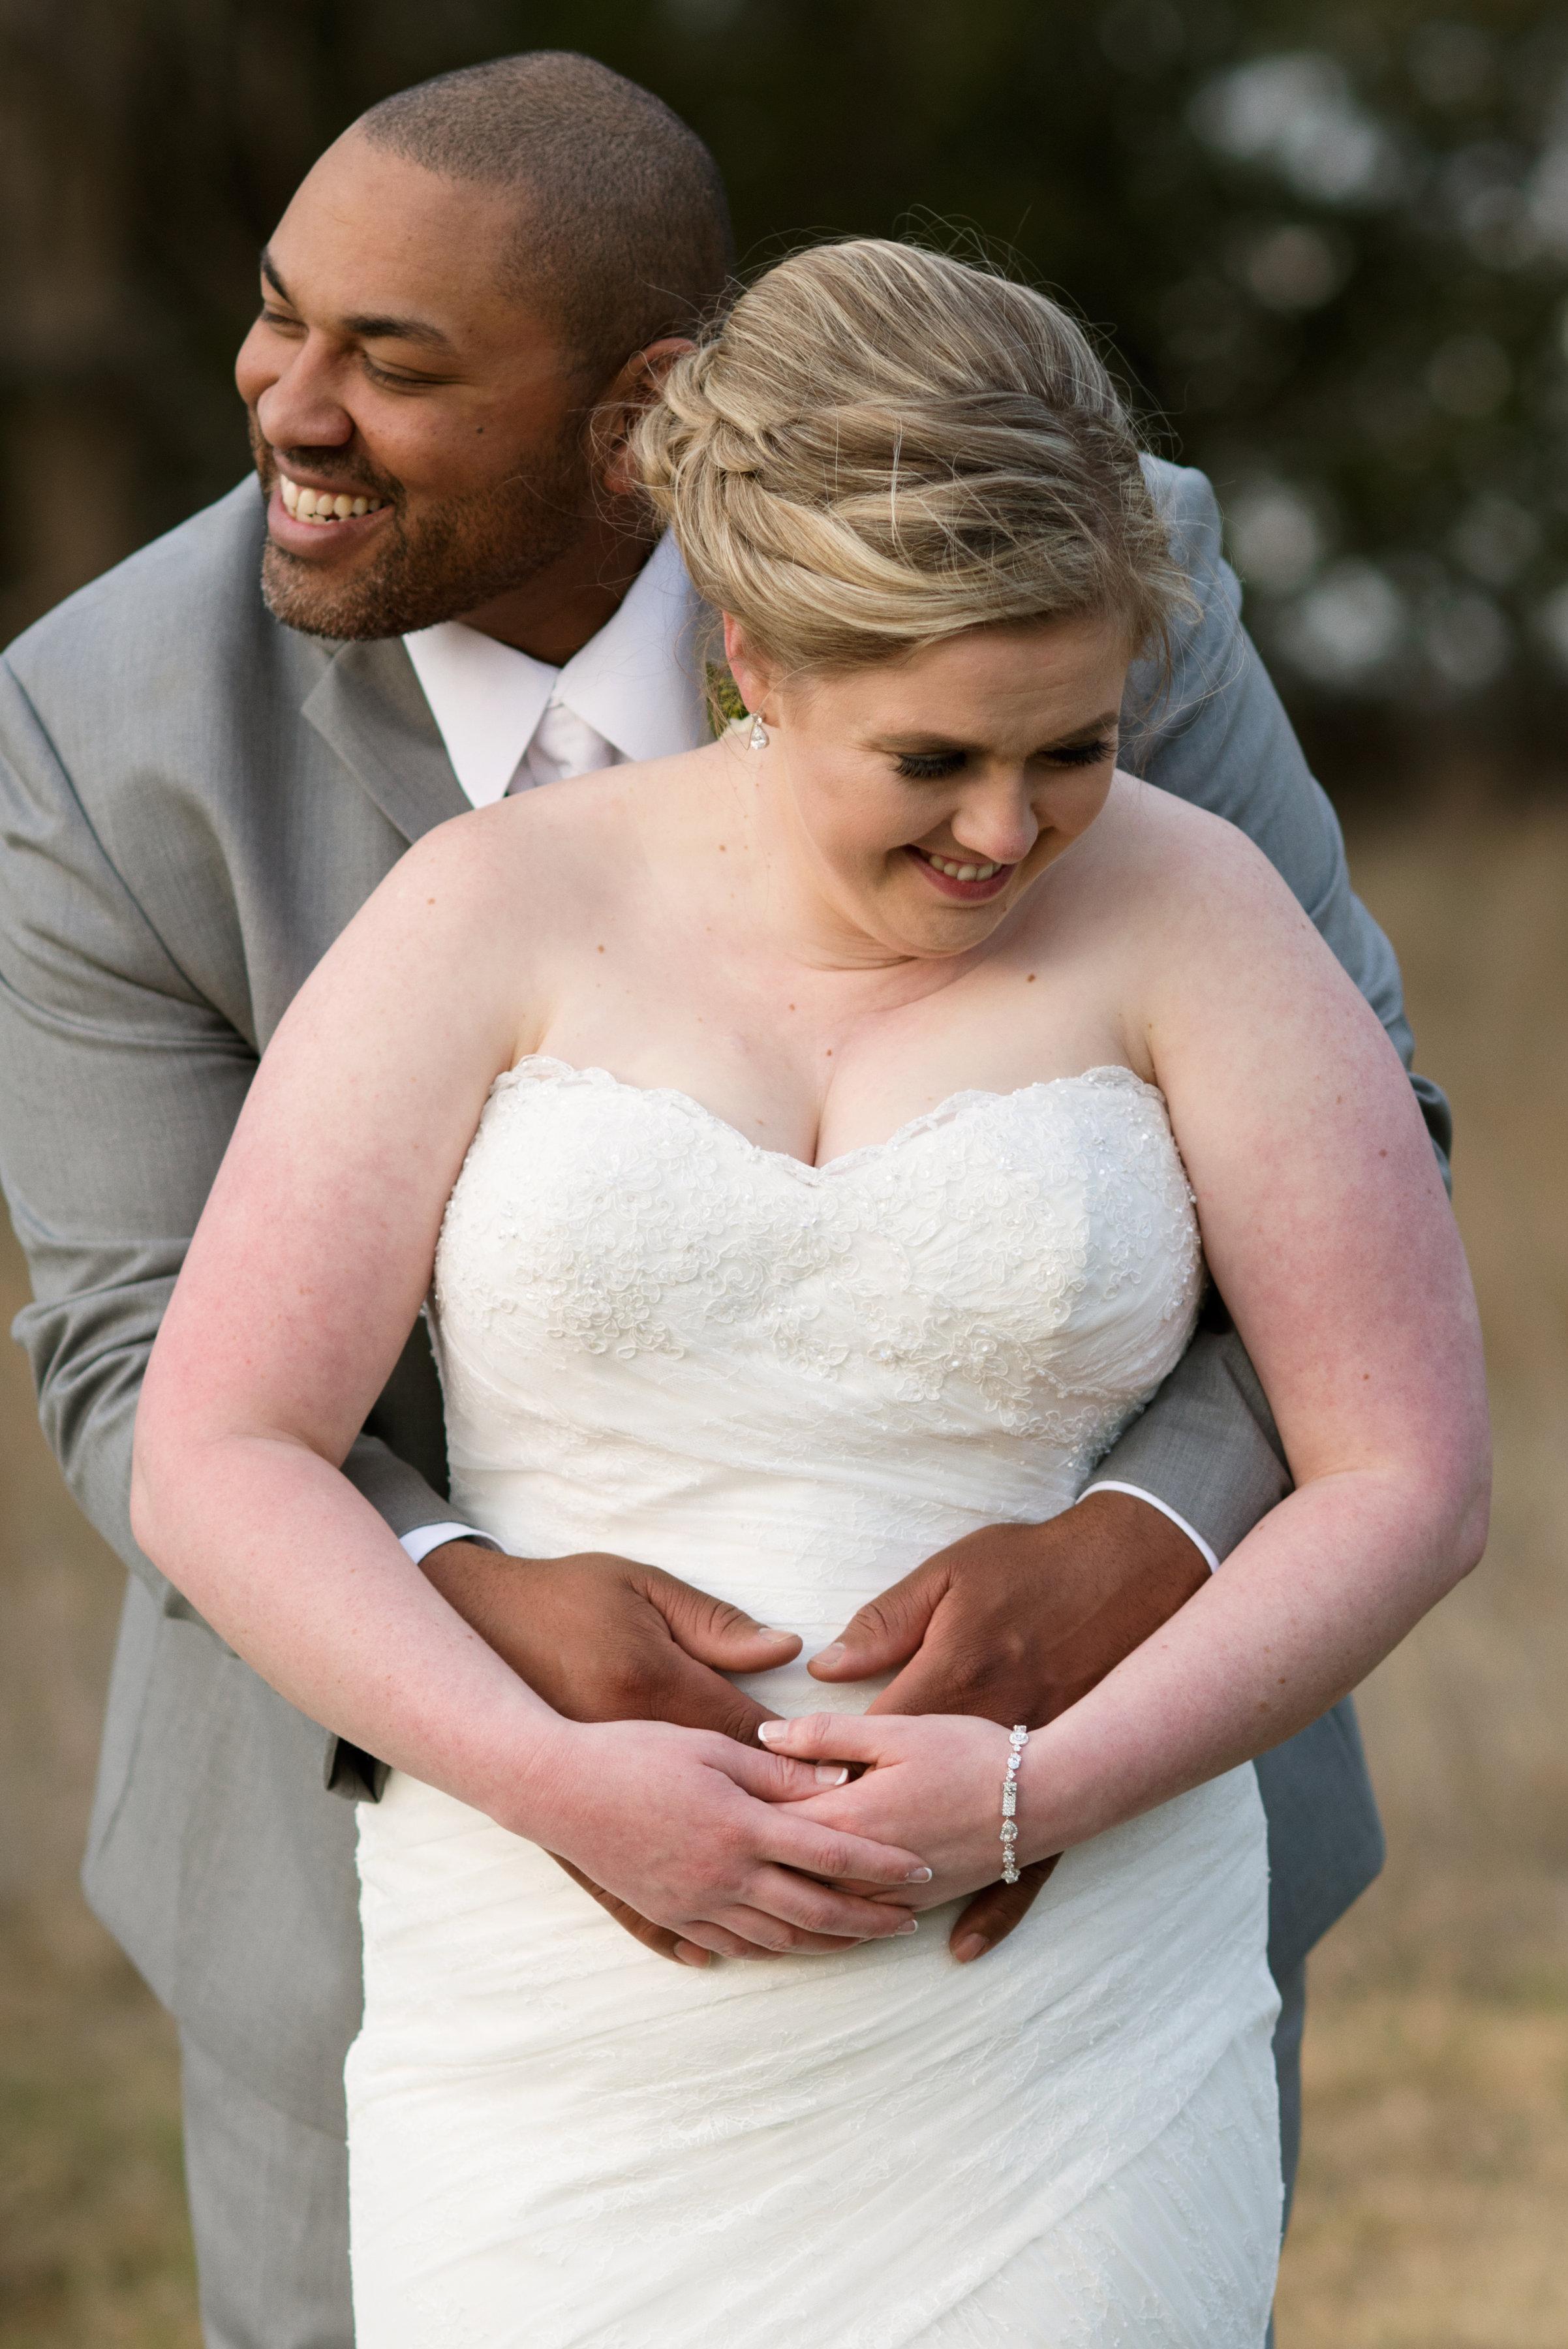 Ma Maison Austin Wedding Venue_ Austin Wedding Planner Heavenly Day Events _ Kristi Wright Austin Wedding Photographer20160306_0181.JPG